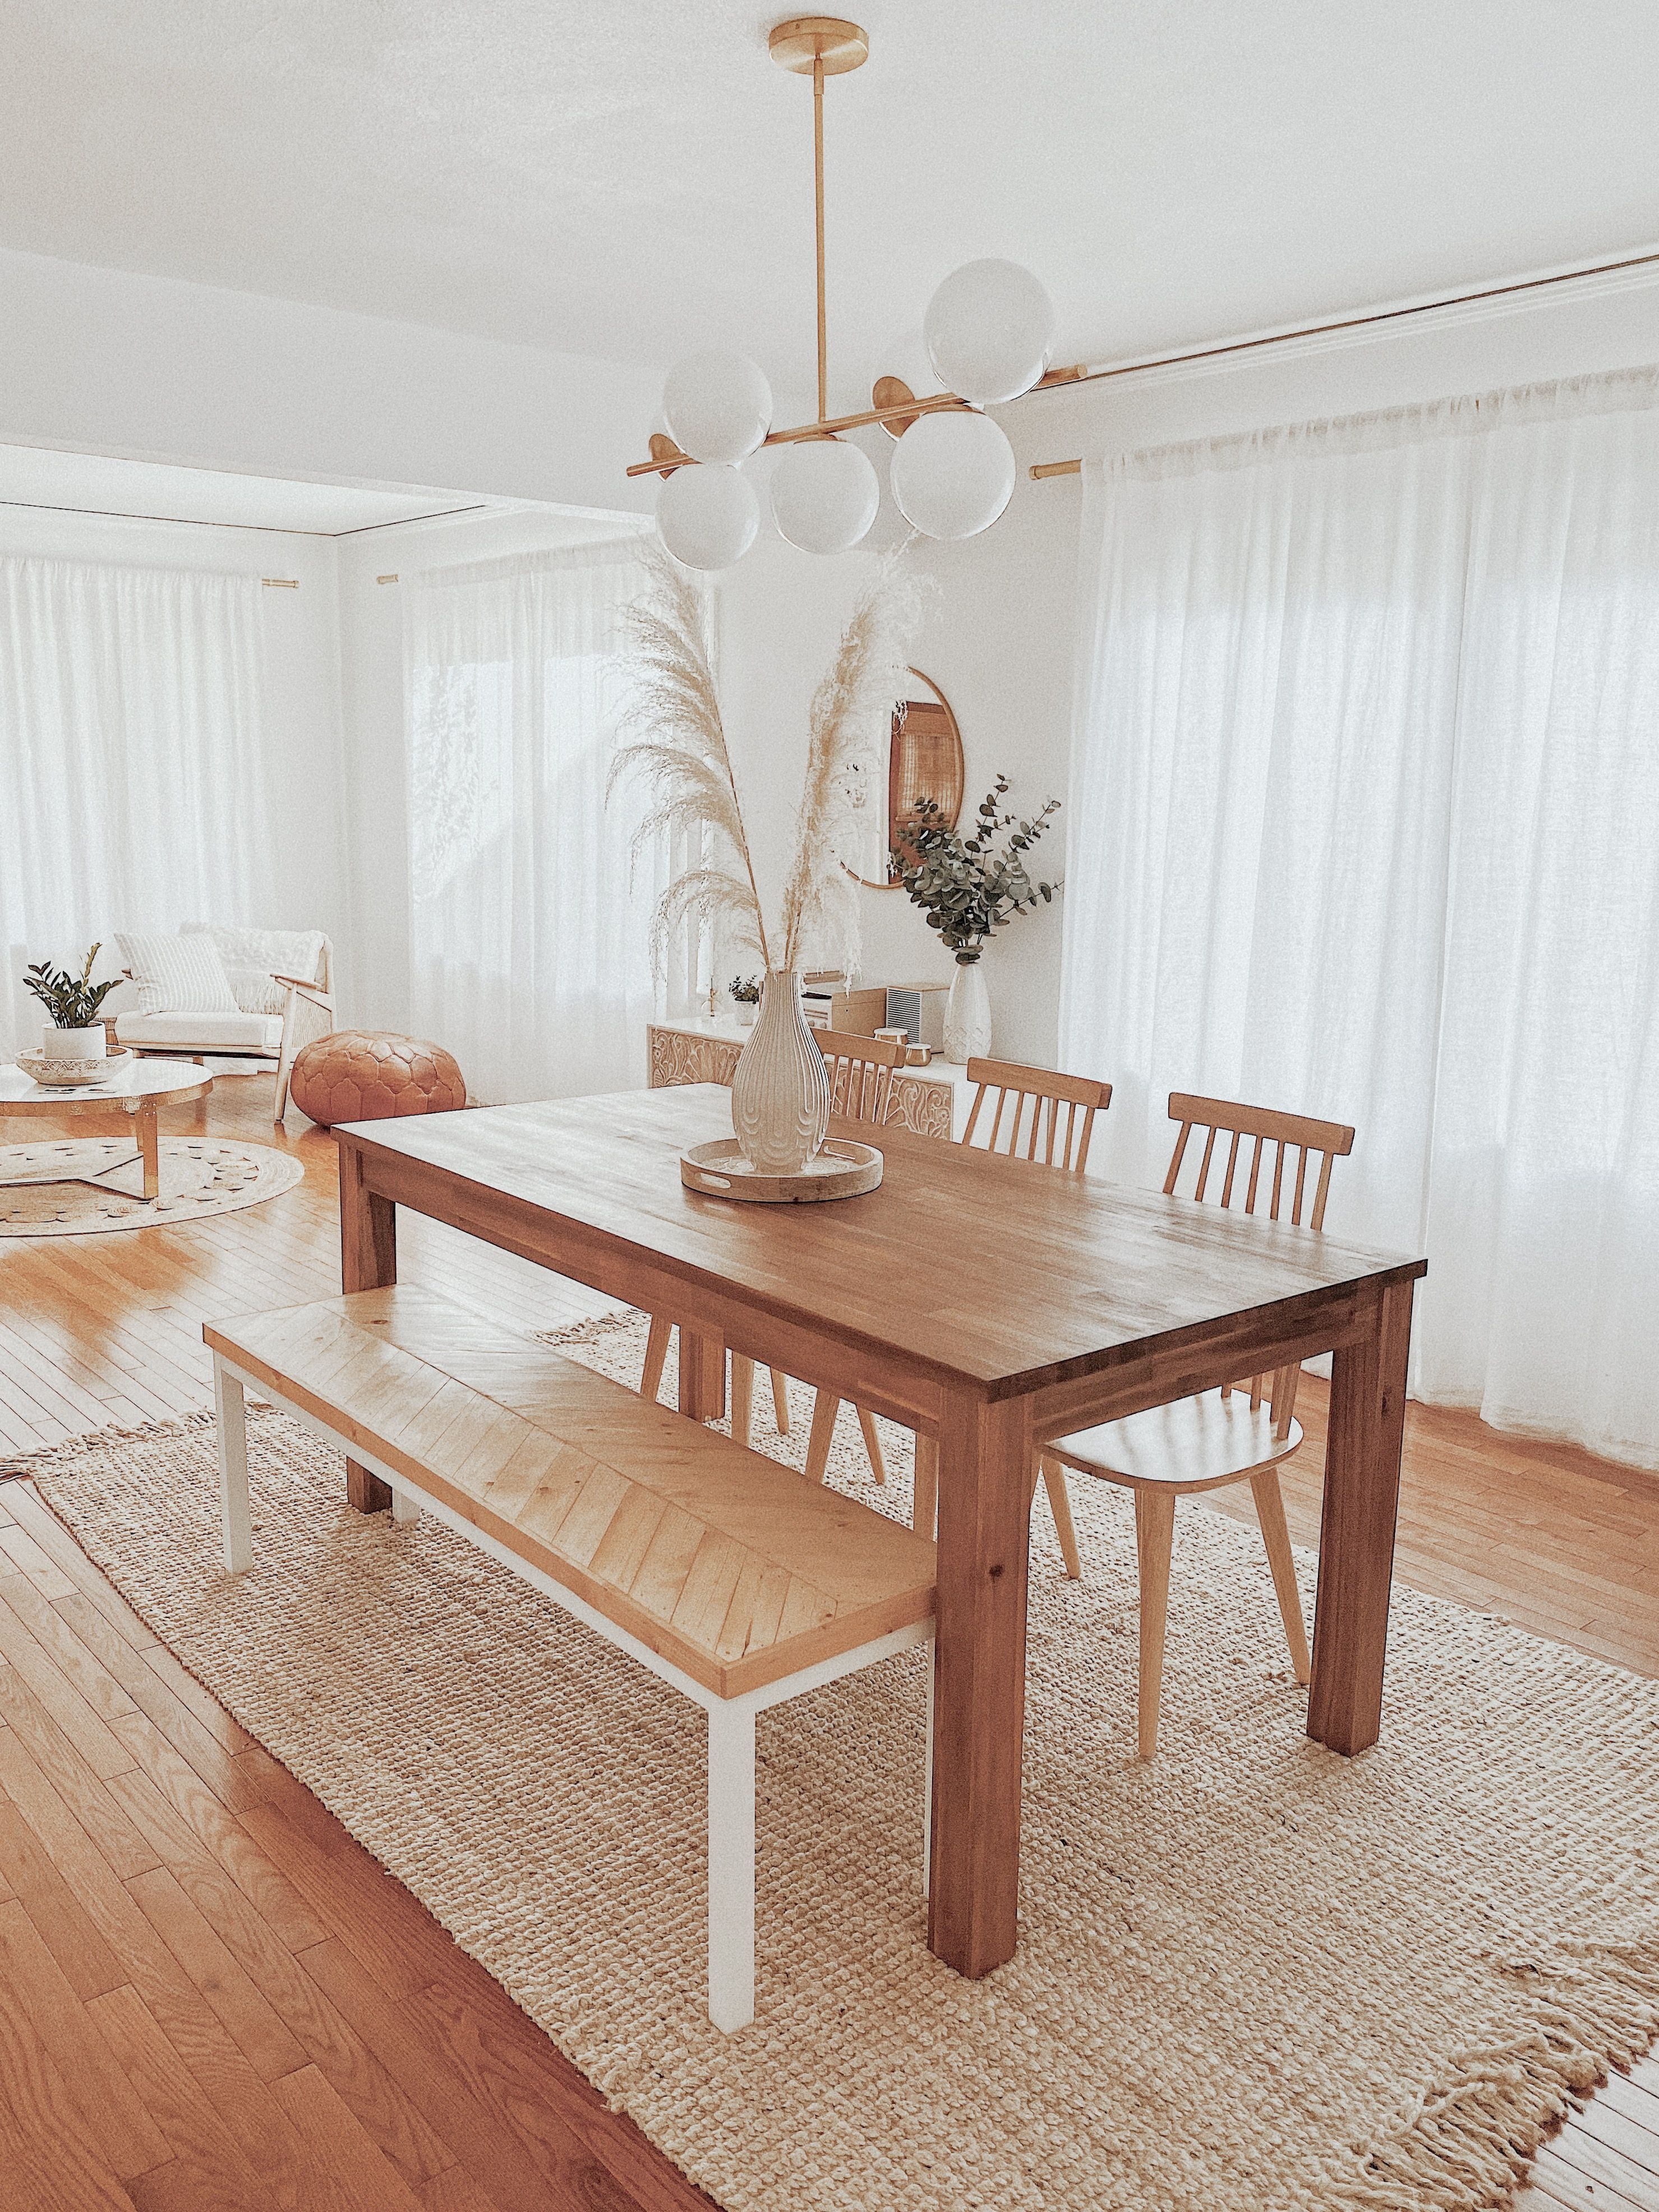 Boho Bohemian White Wood Cozy Dining Room Living Space Home Decor Interior Ideas Inspo Bohemianwohnen